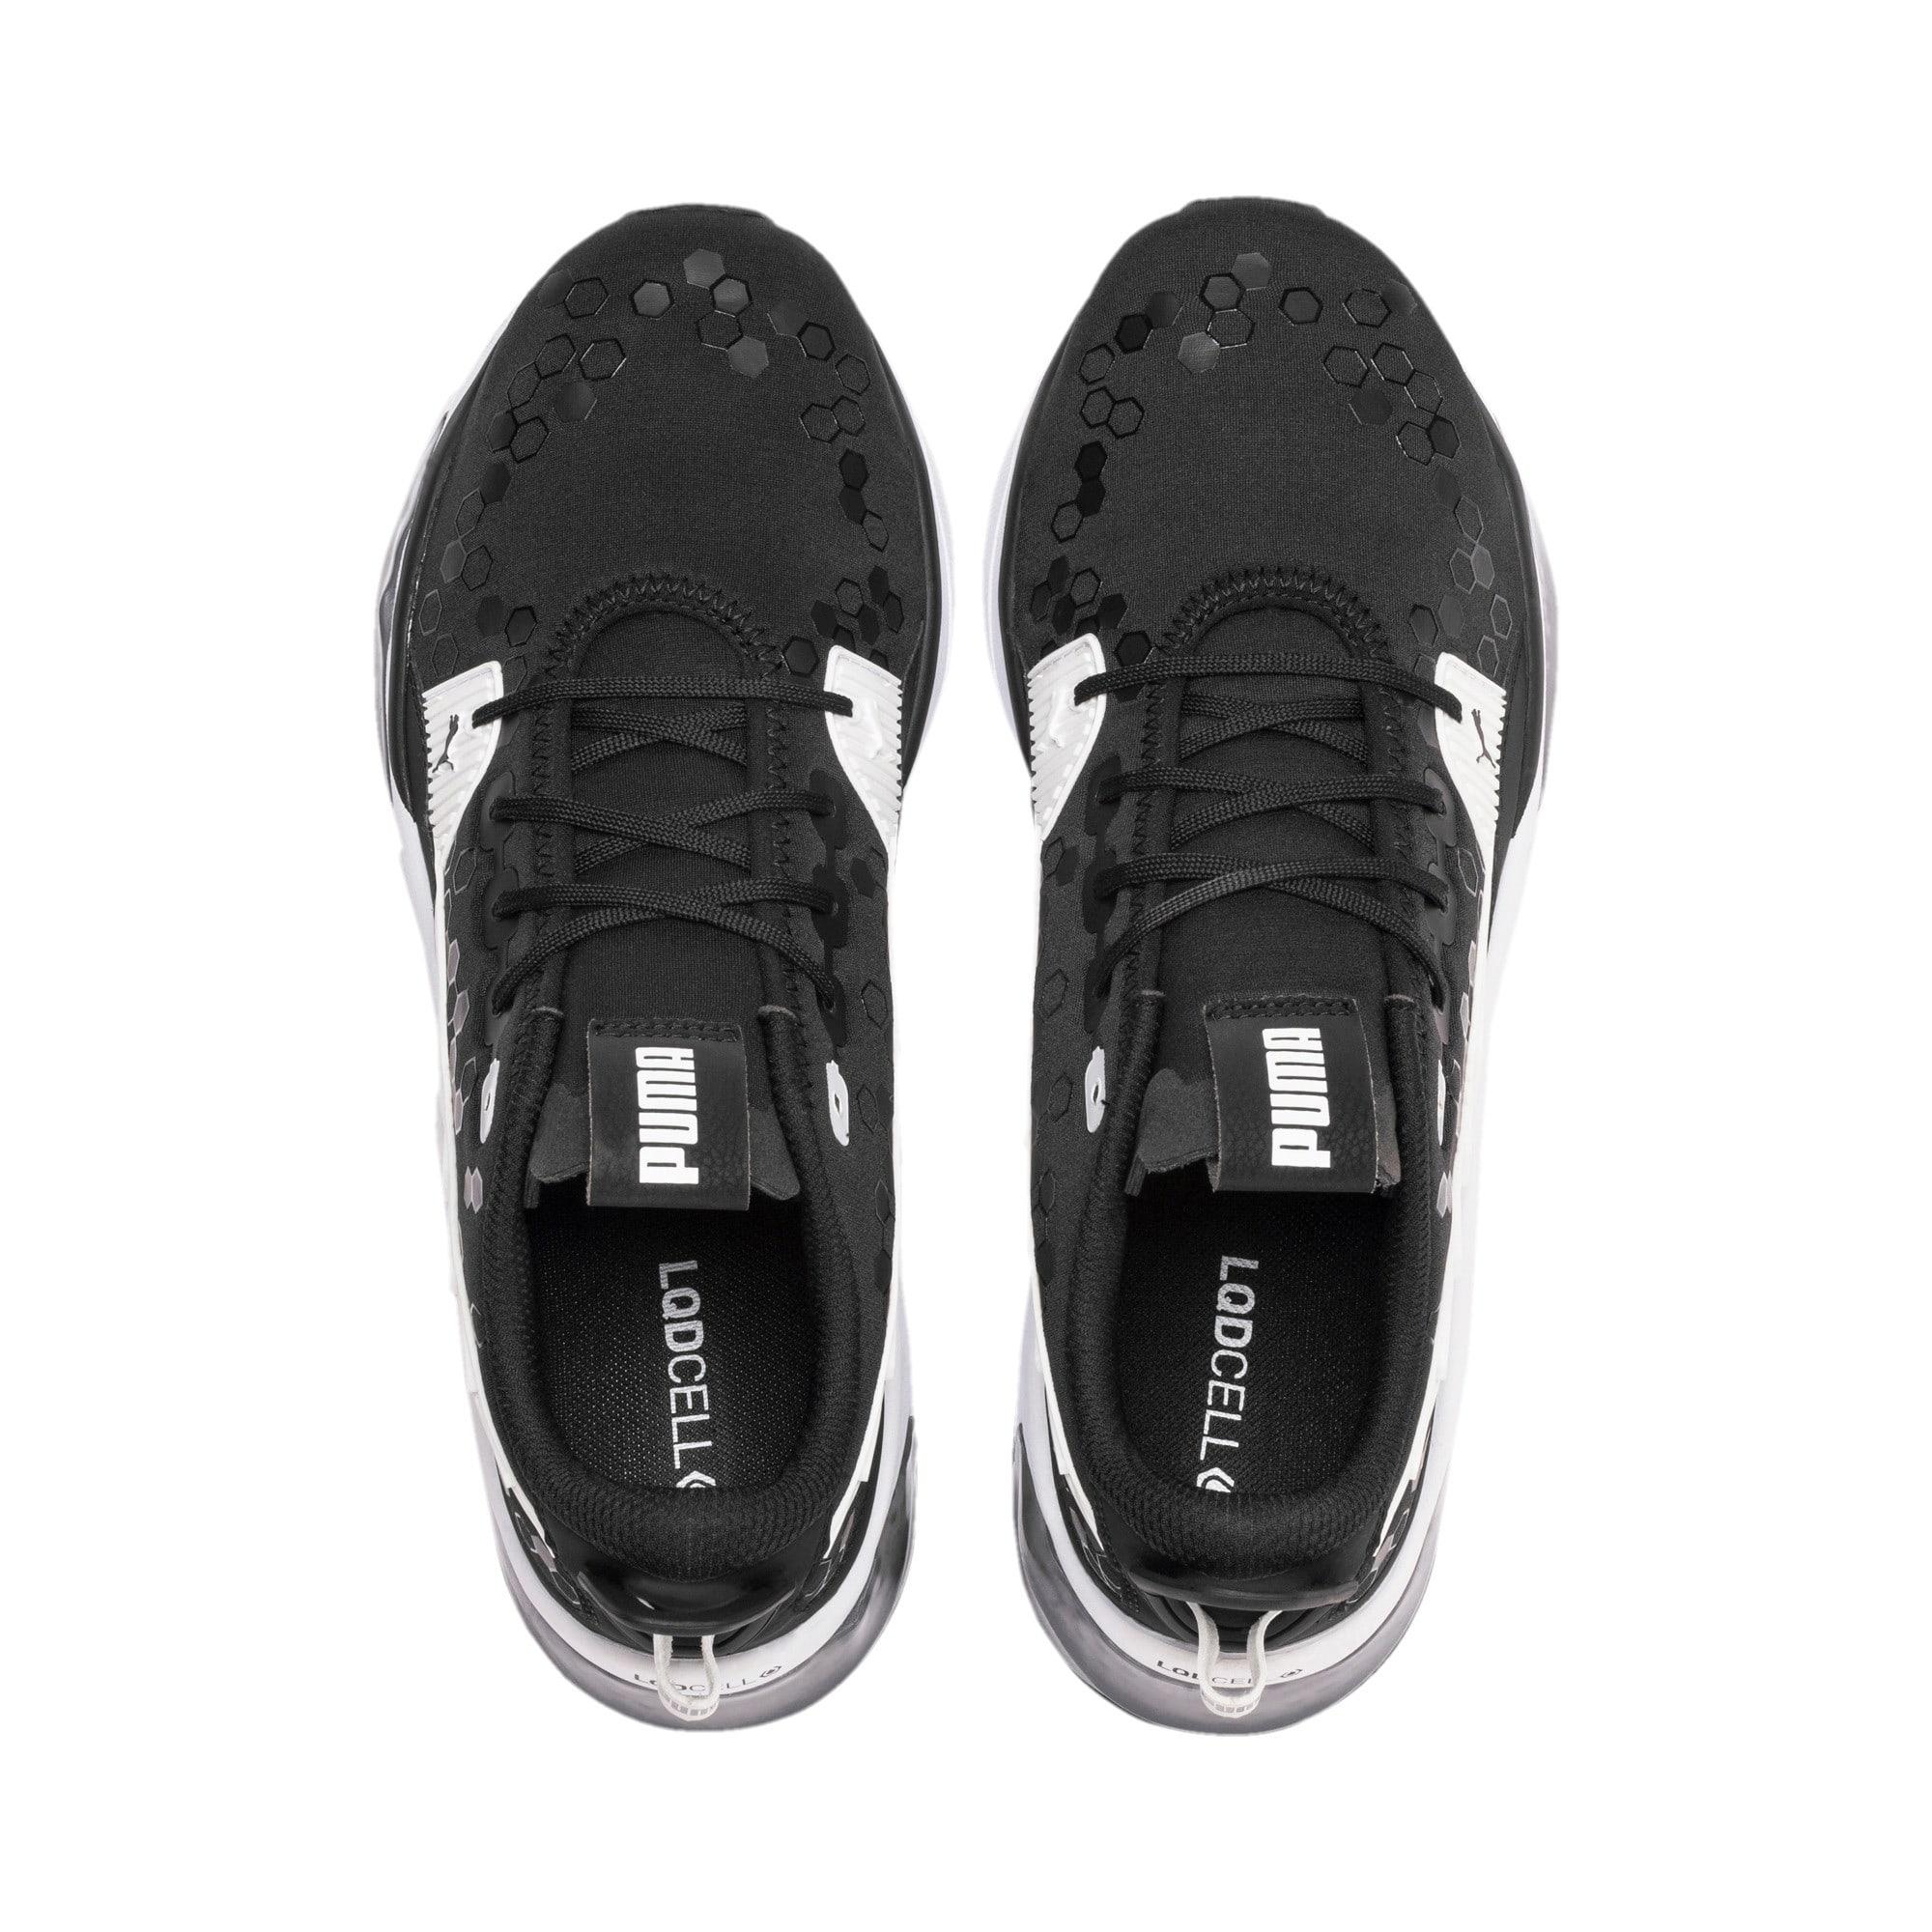 Thumbnail 7 of LQDCELL Optic Training Shoes, Puma Black-Puma White, medium